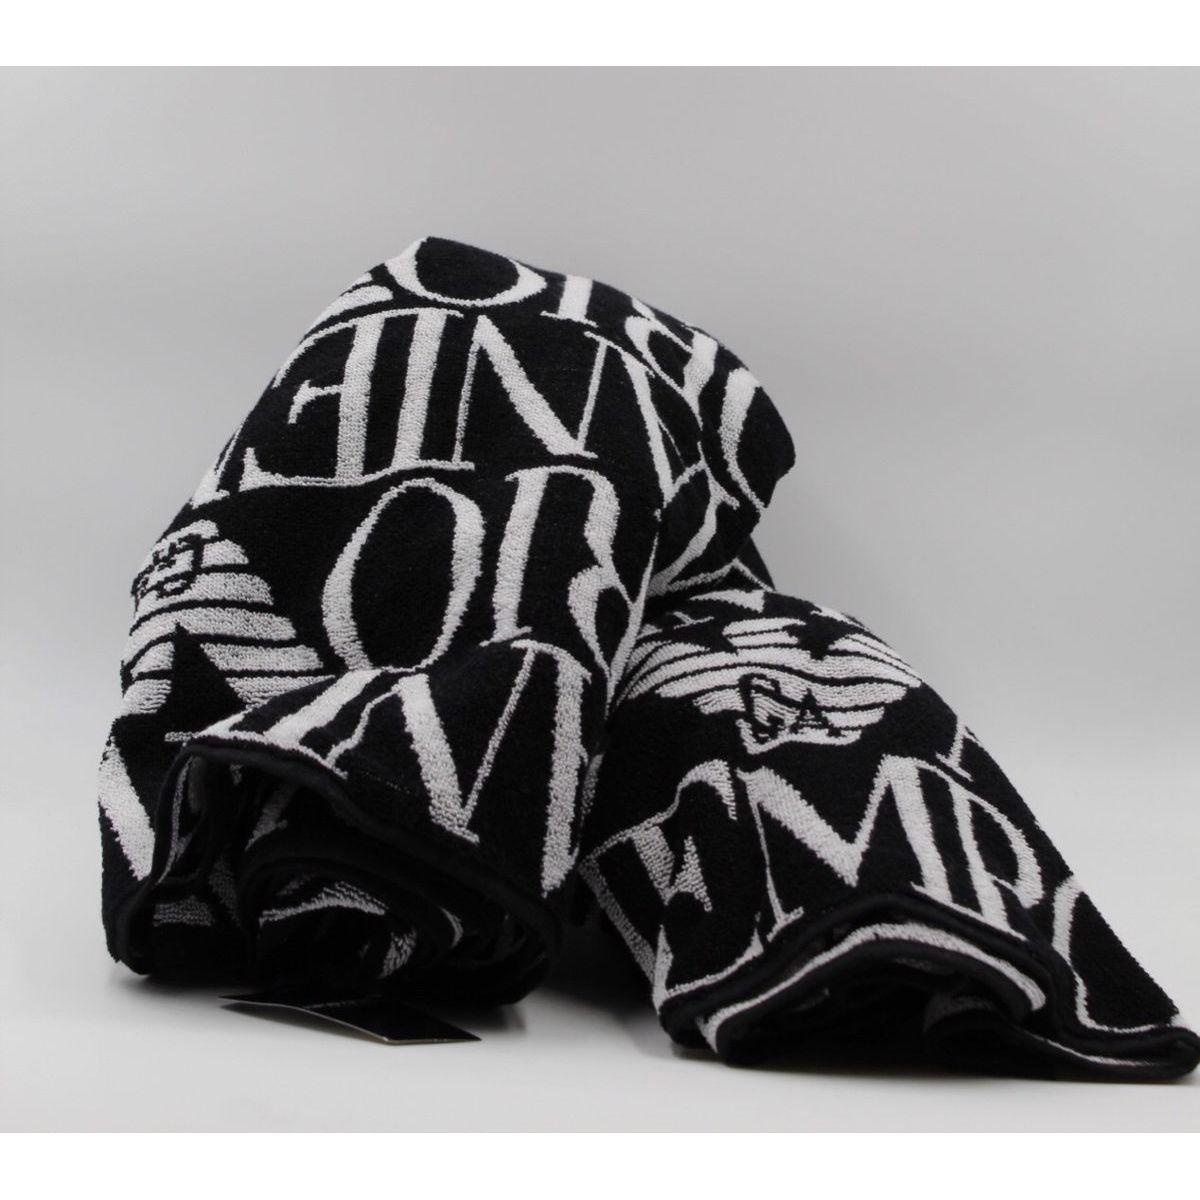 Logo towel Black Emporio Armani